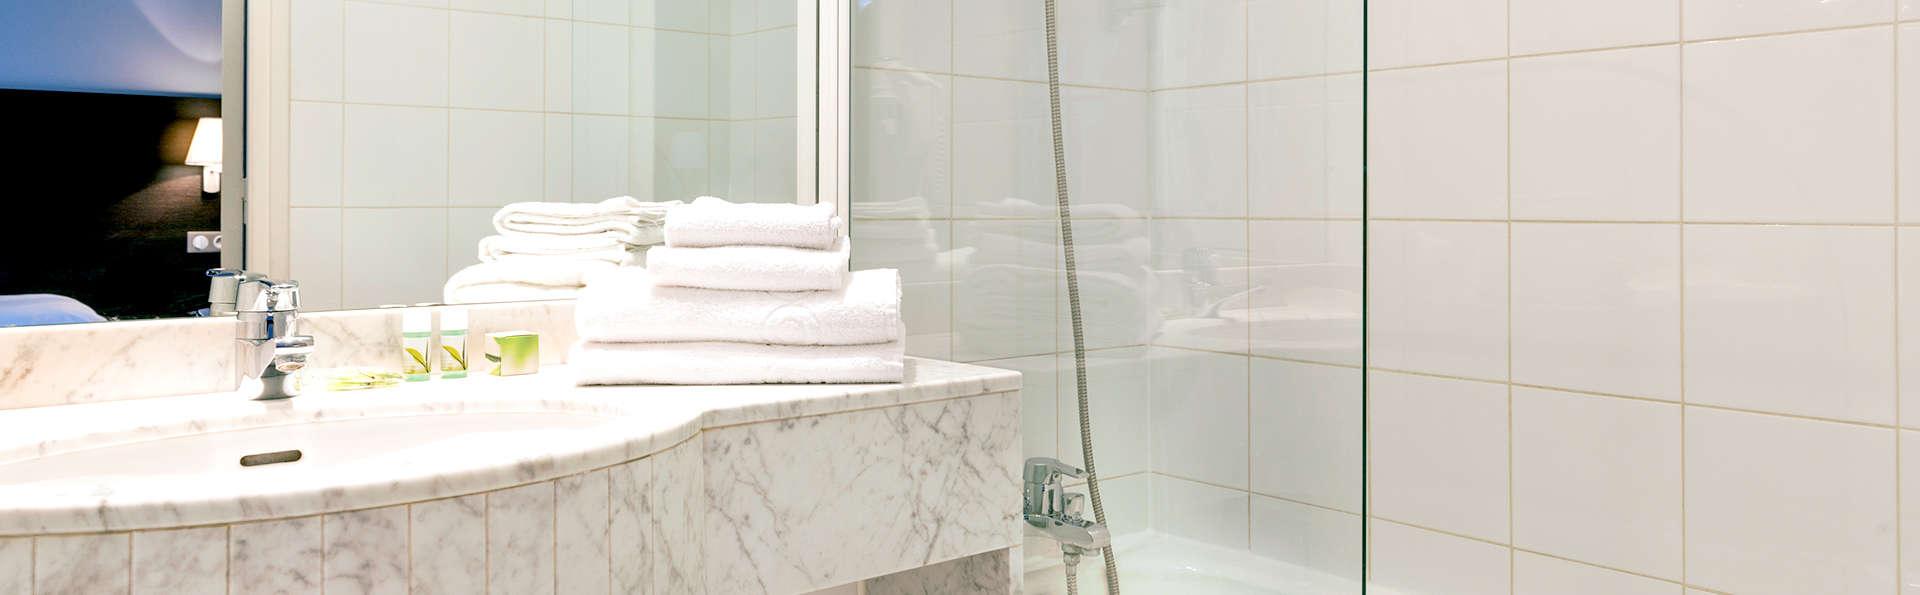 Hôtel des Ecrivains - Edit_Bathroom.jpg